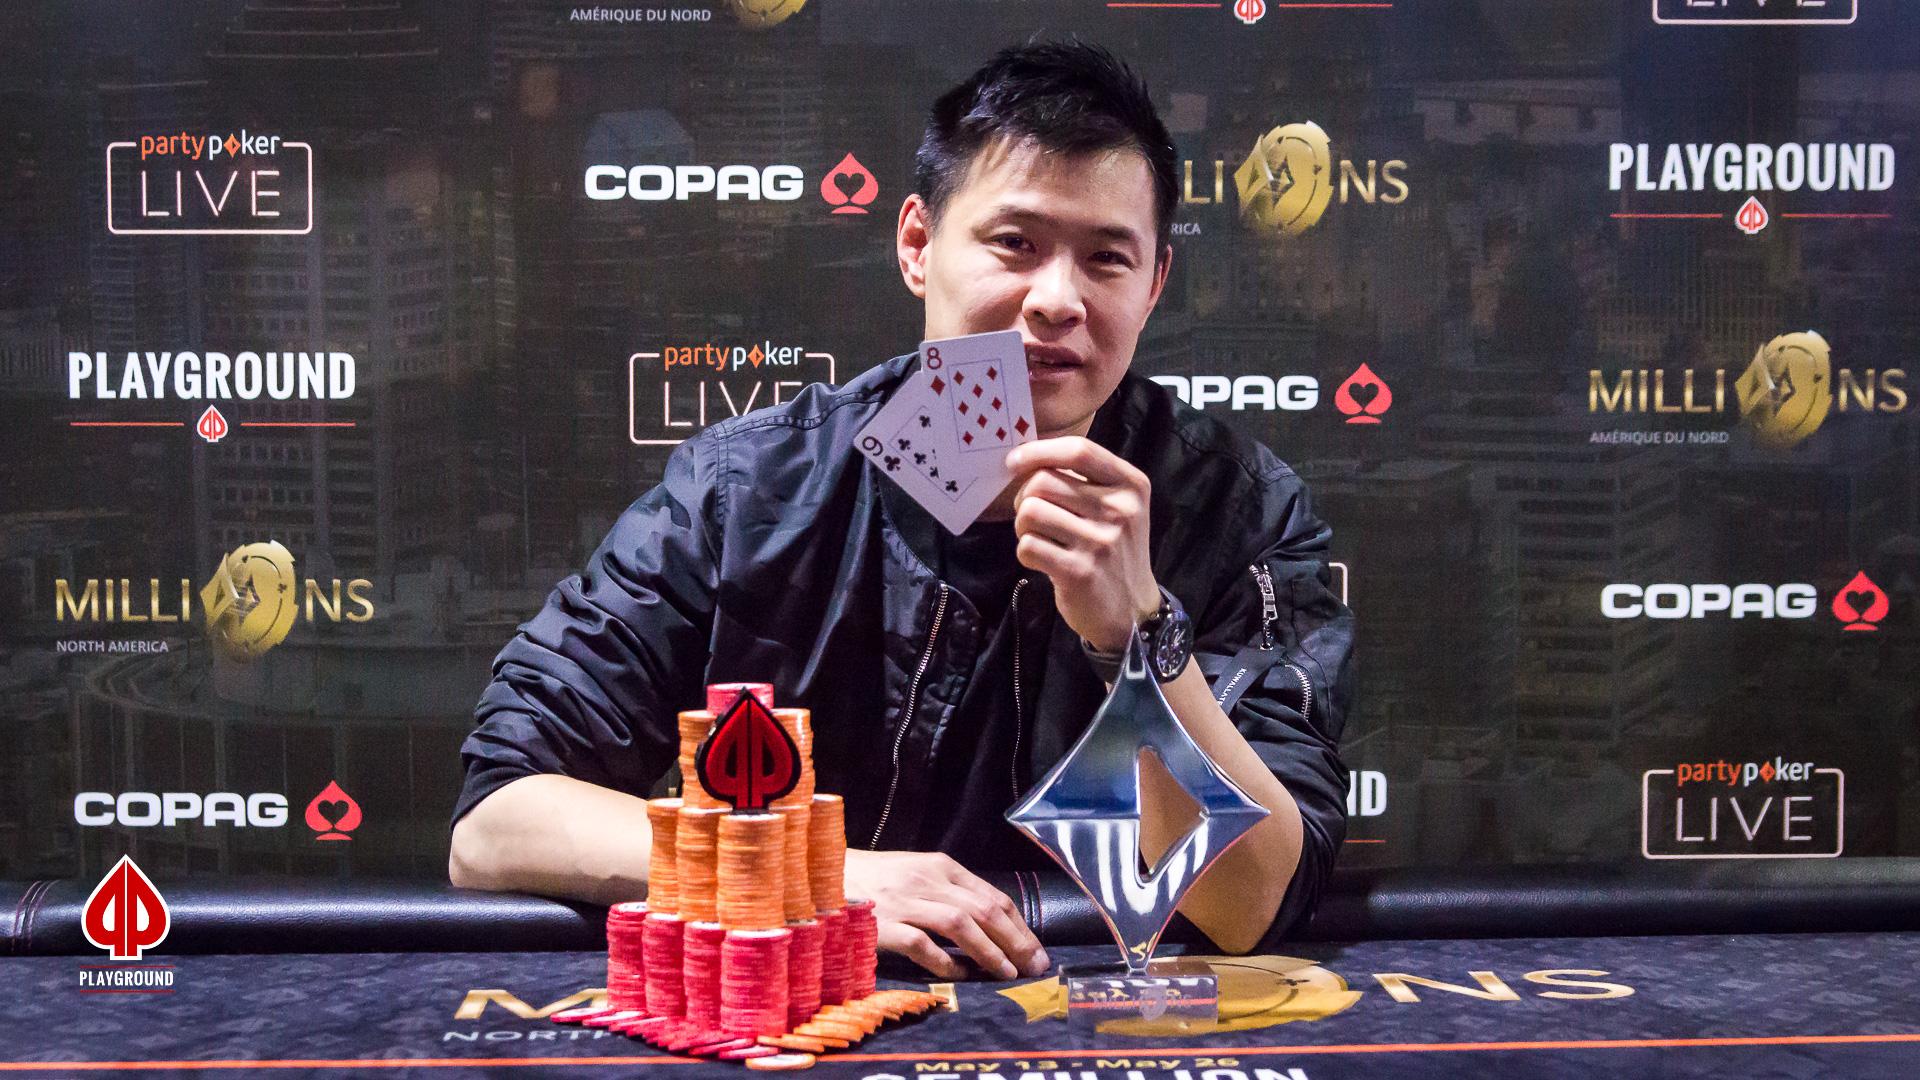 Kieu Lam Champion de l'Évènement No. 8, le Big Bounty